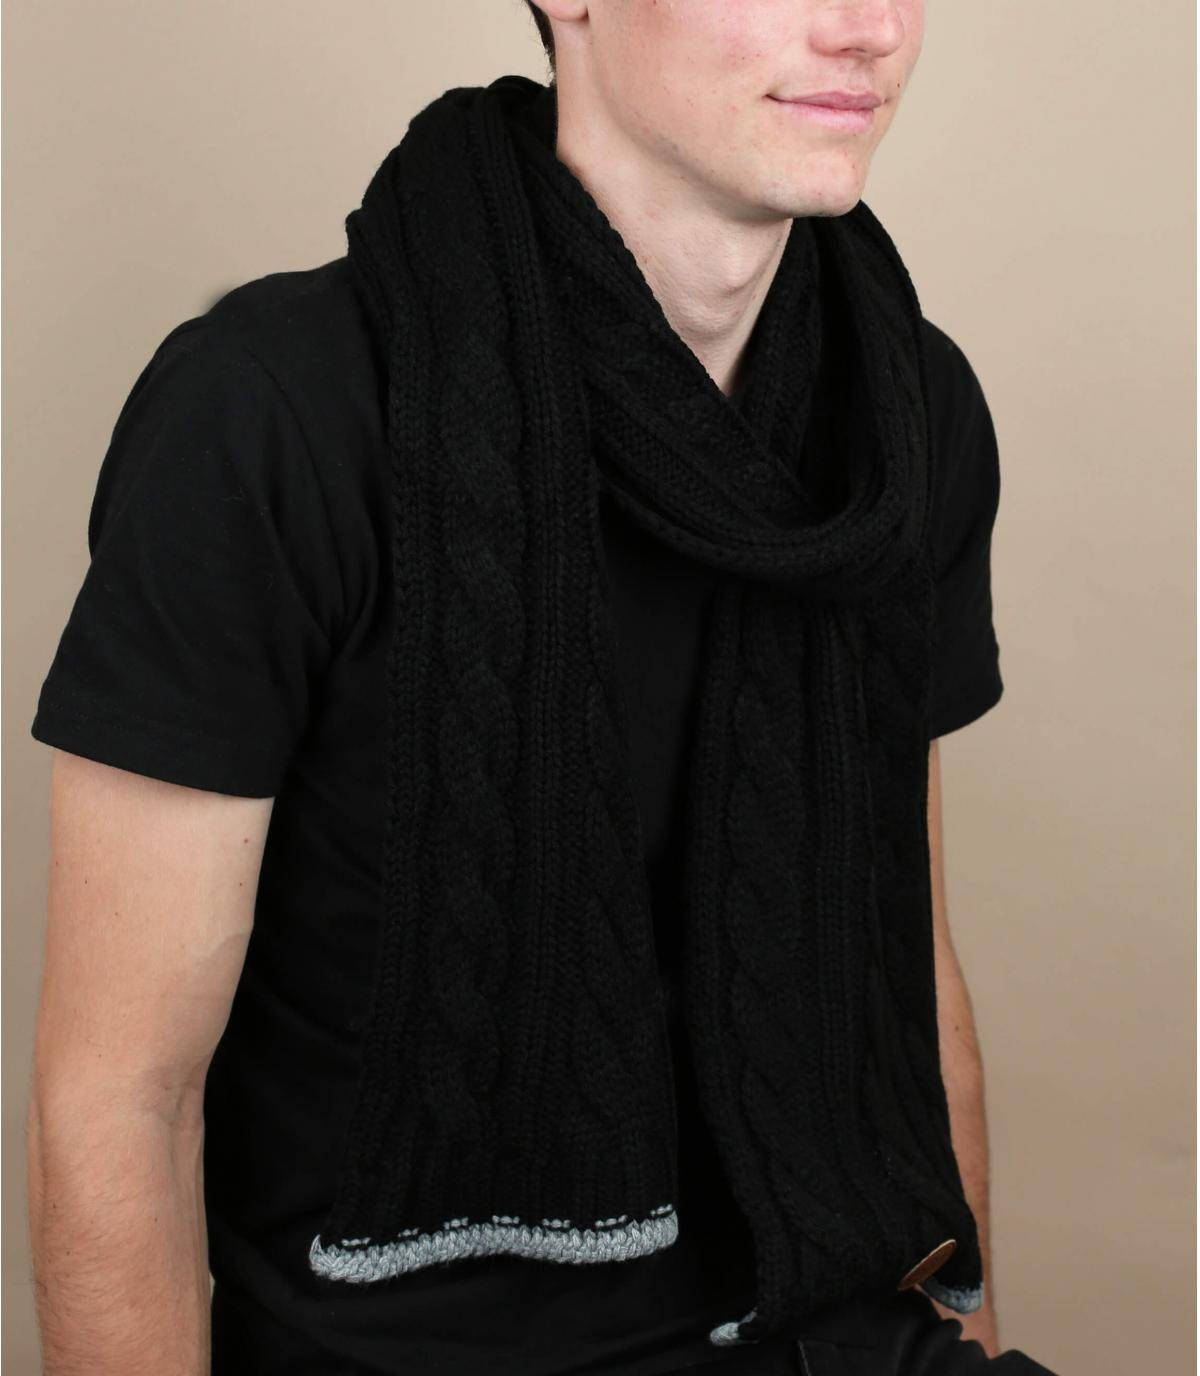 bufanda negra trenzada